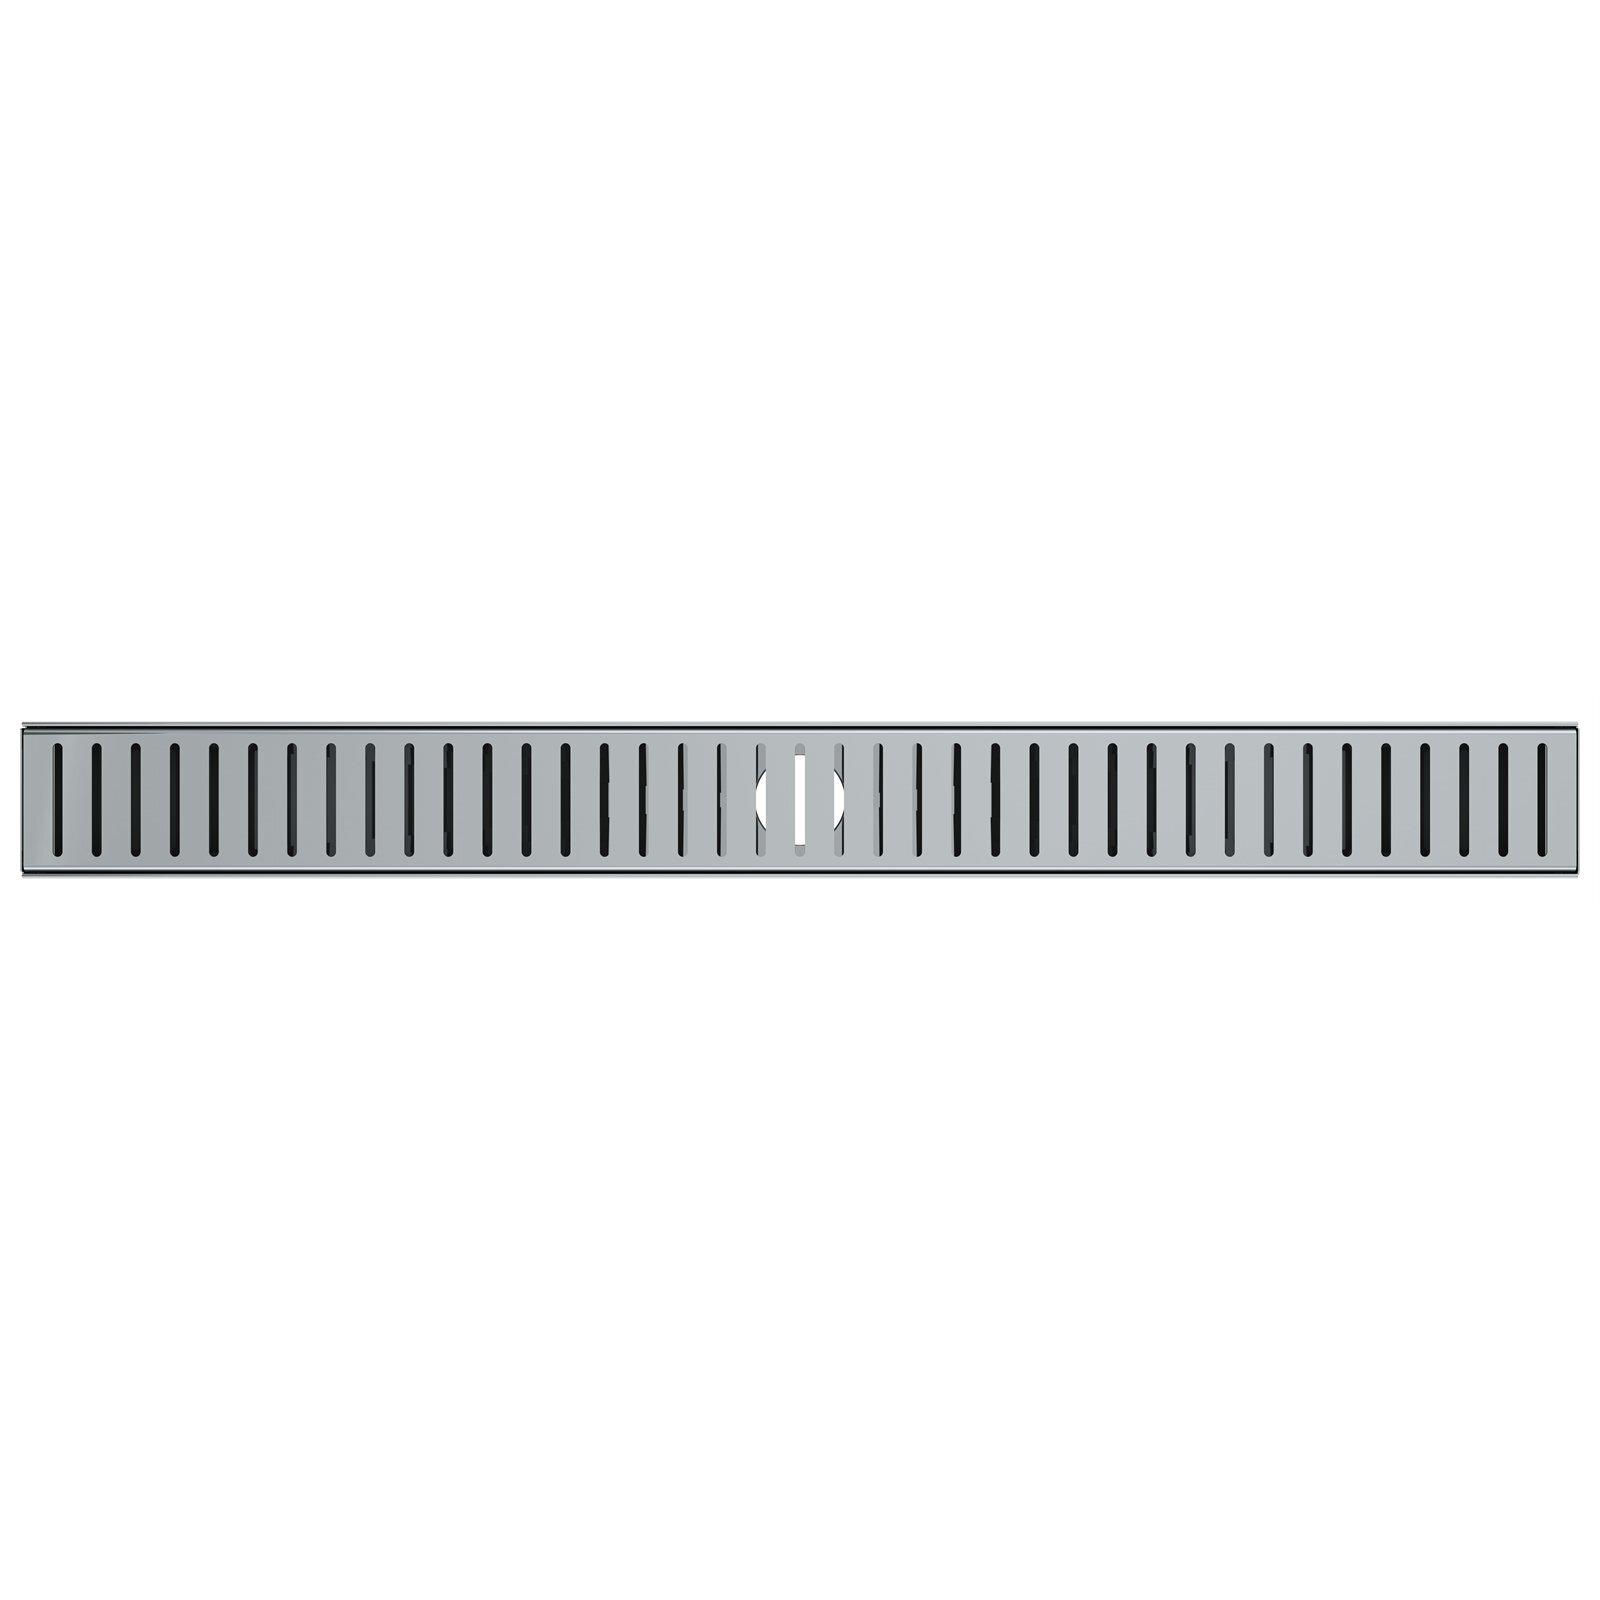 Stein 1000 x 80 x 20mm Quick Tile Channel Drain Kit